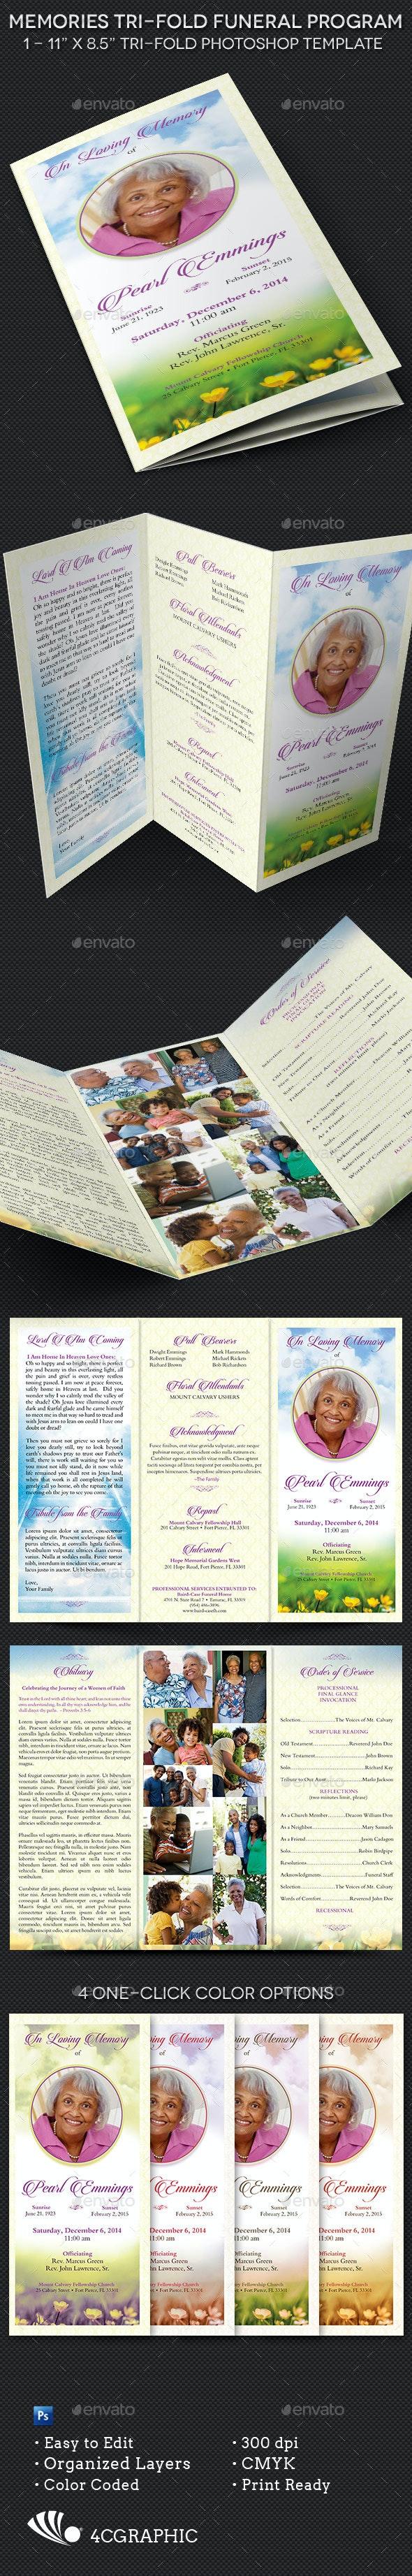 Memories Tri-fold Funeral Program Template - Informational Brochures